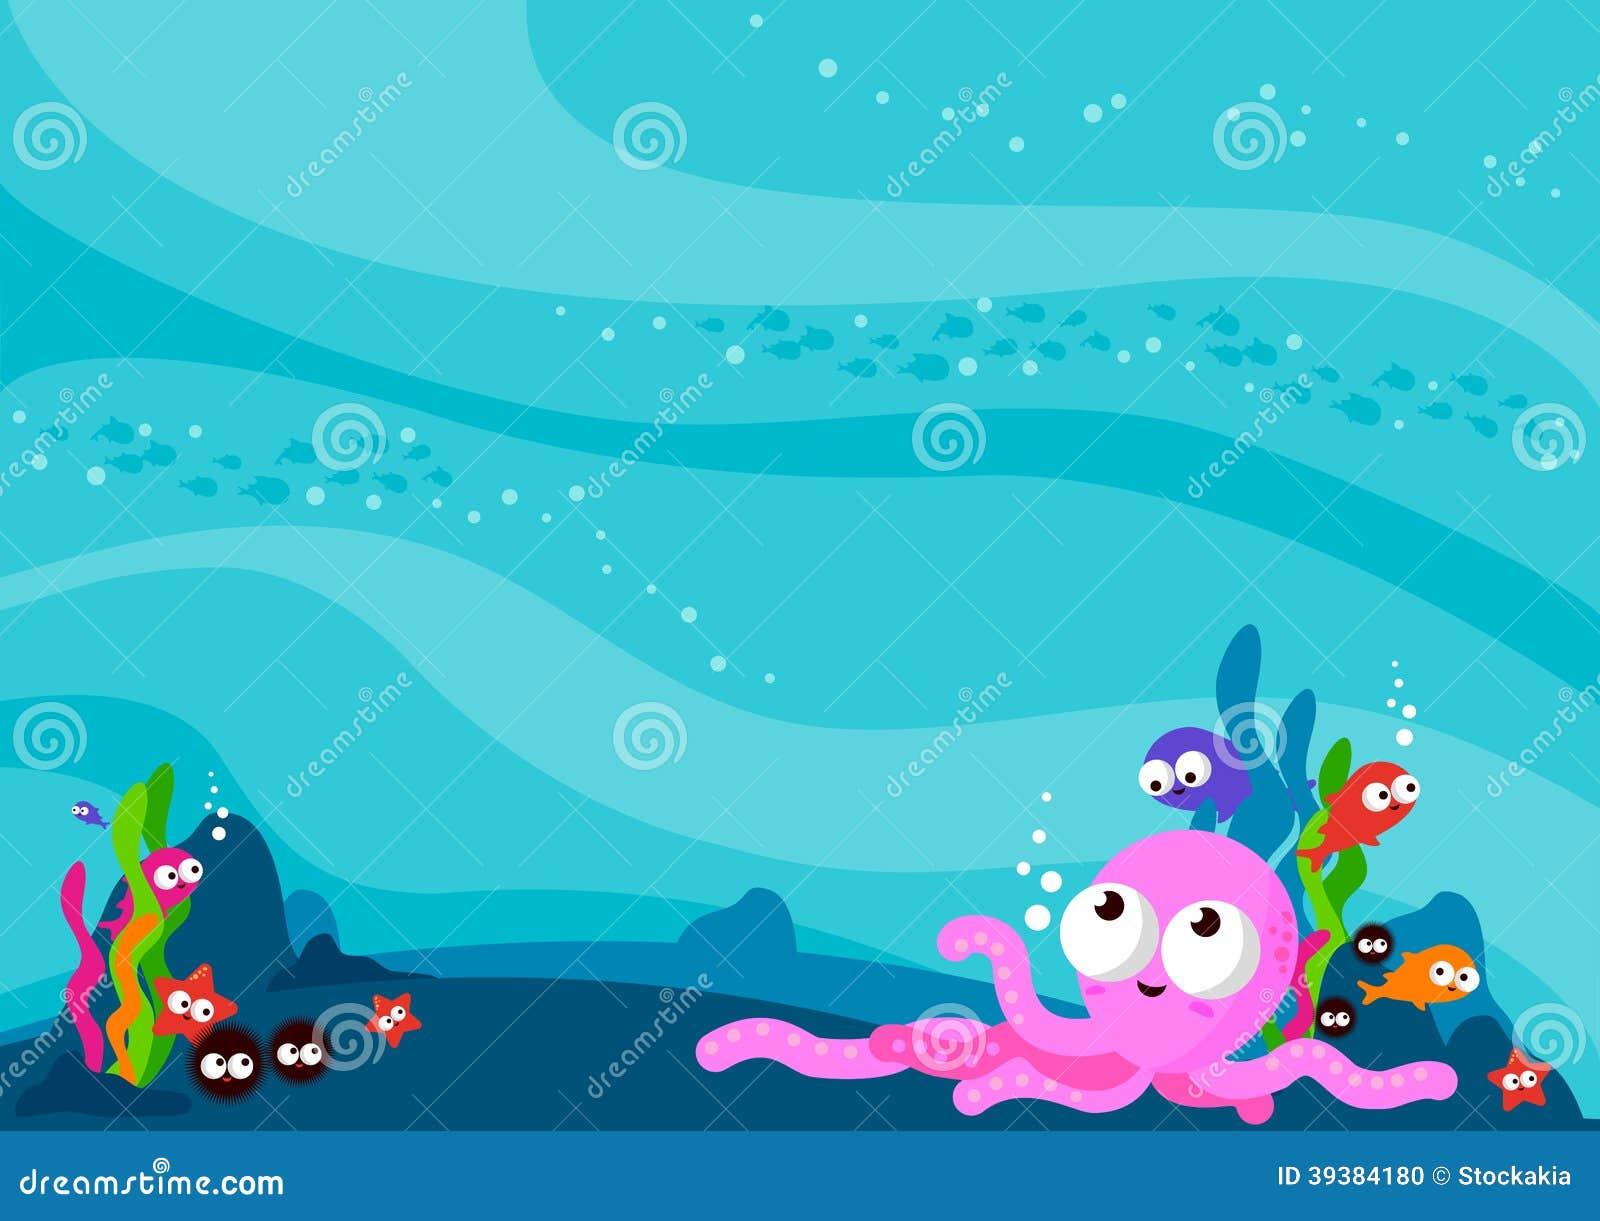 underwater cartoon wallpaper - photo #6